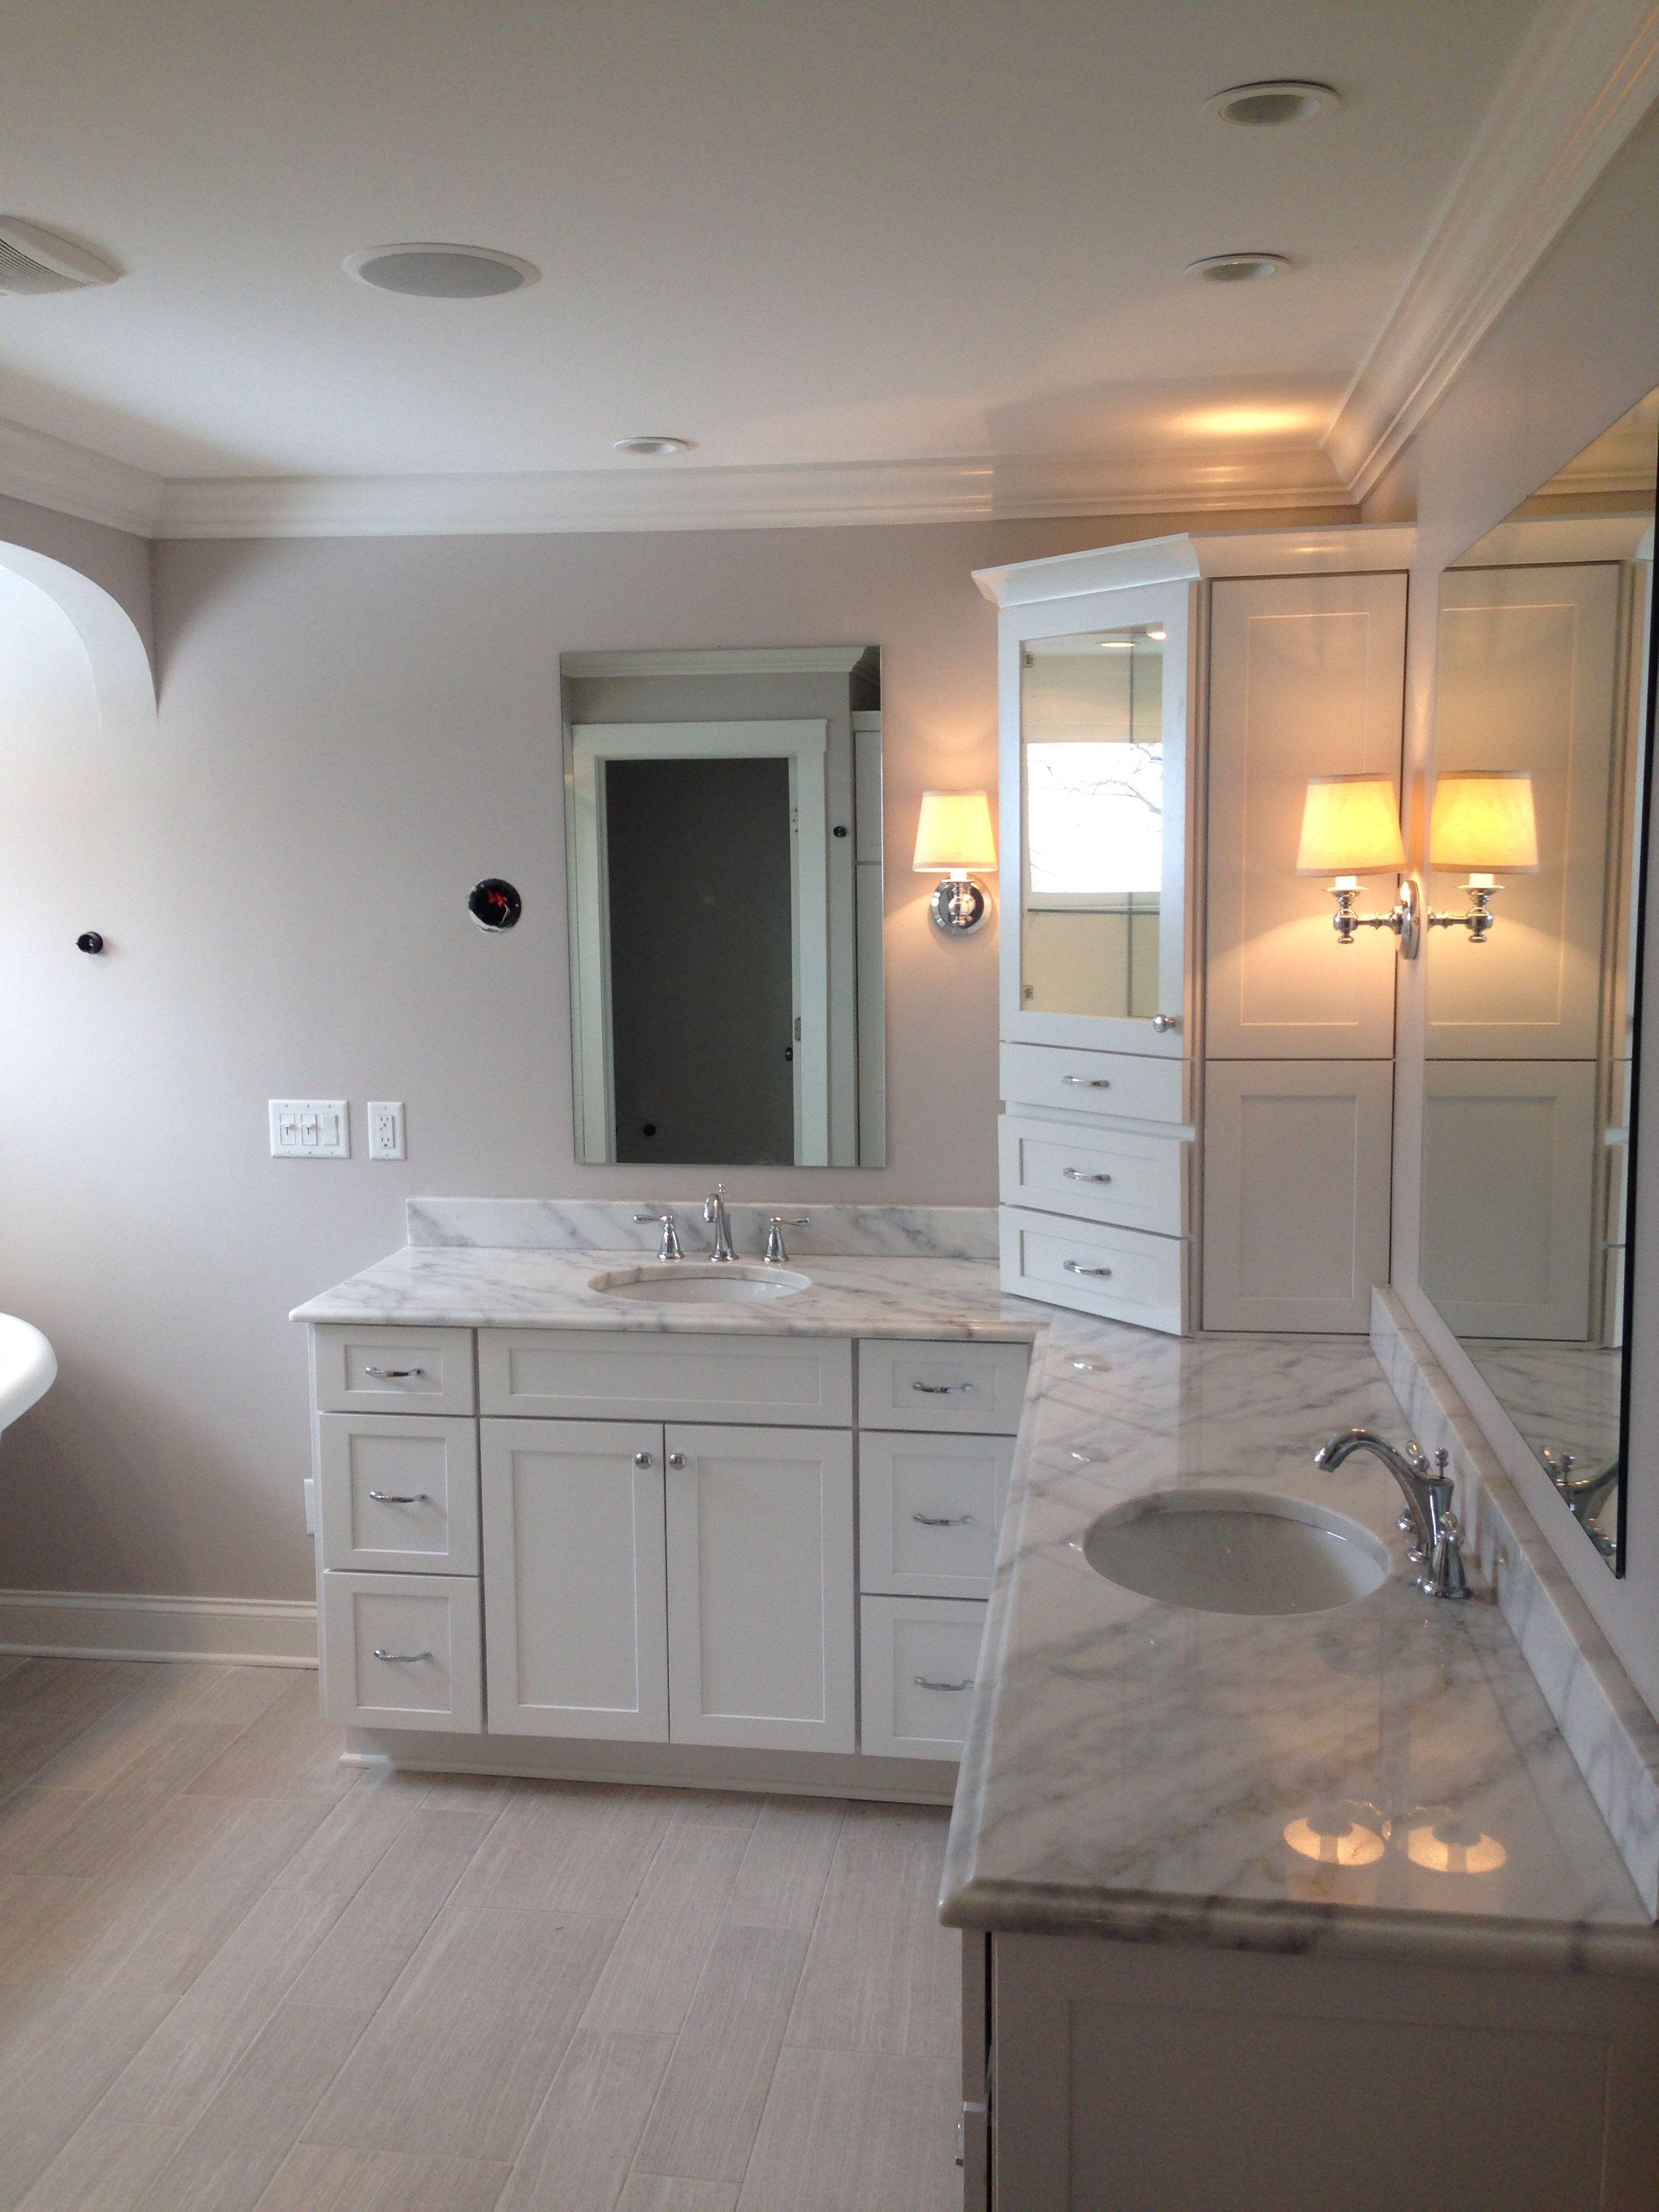 Marble Bath Ideas For Master Bath Light Tile Floor With Gray Walls